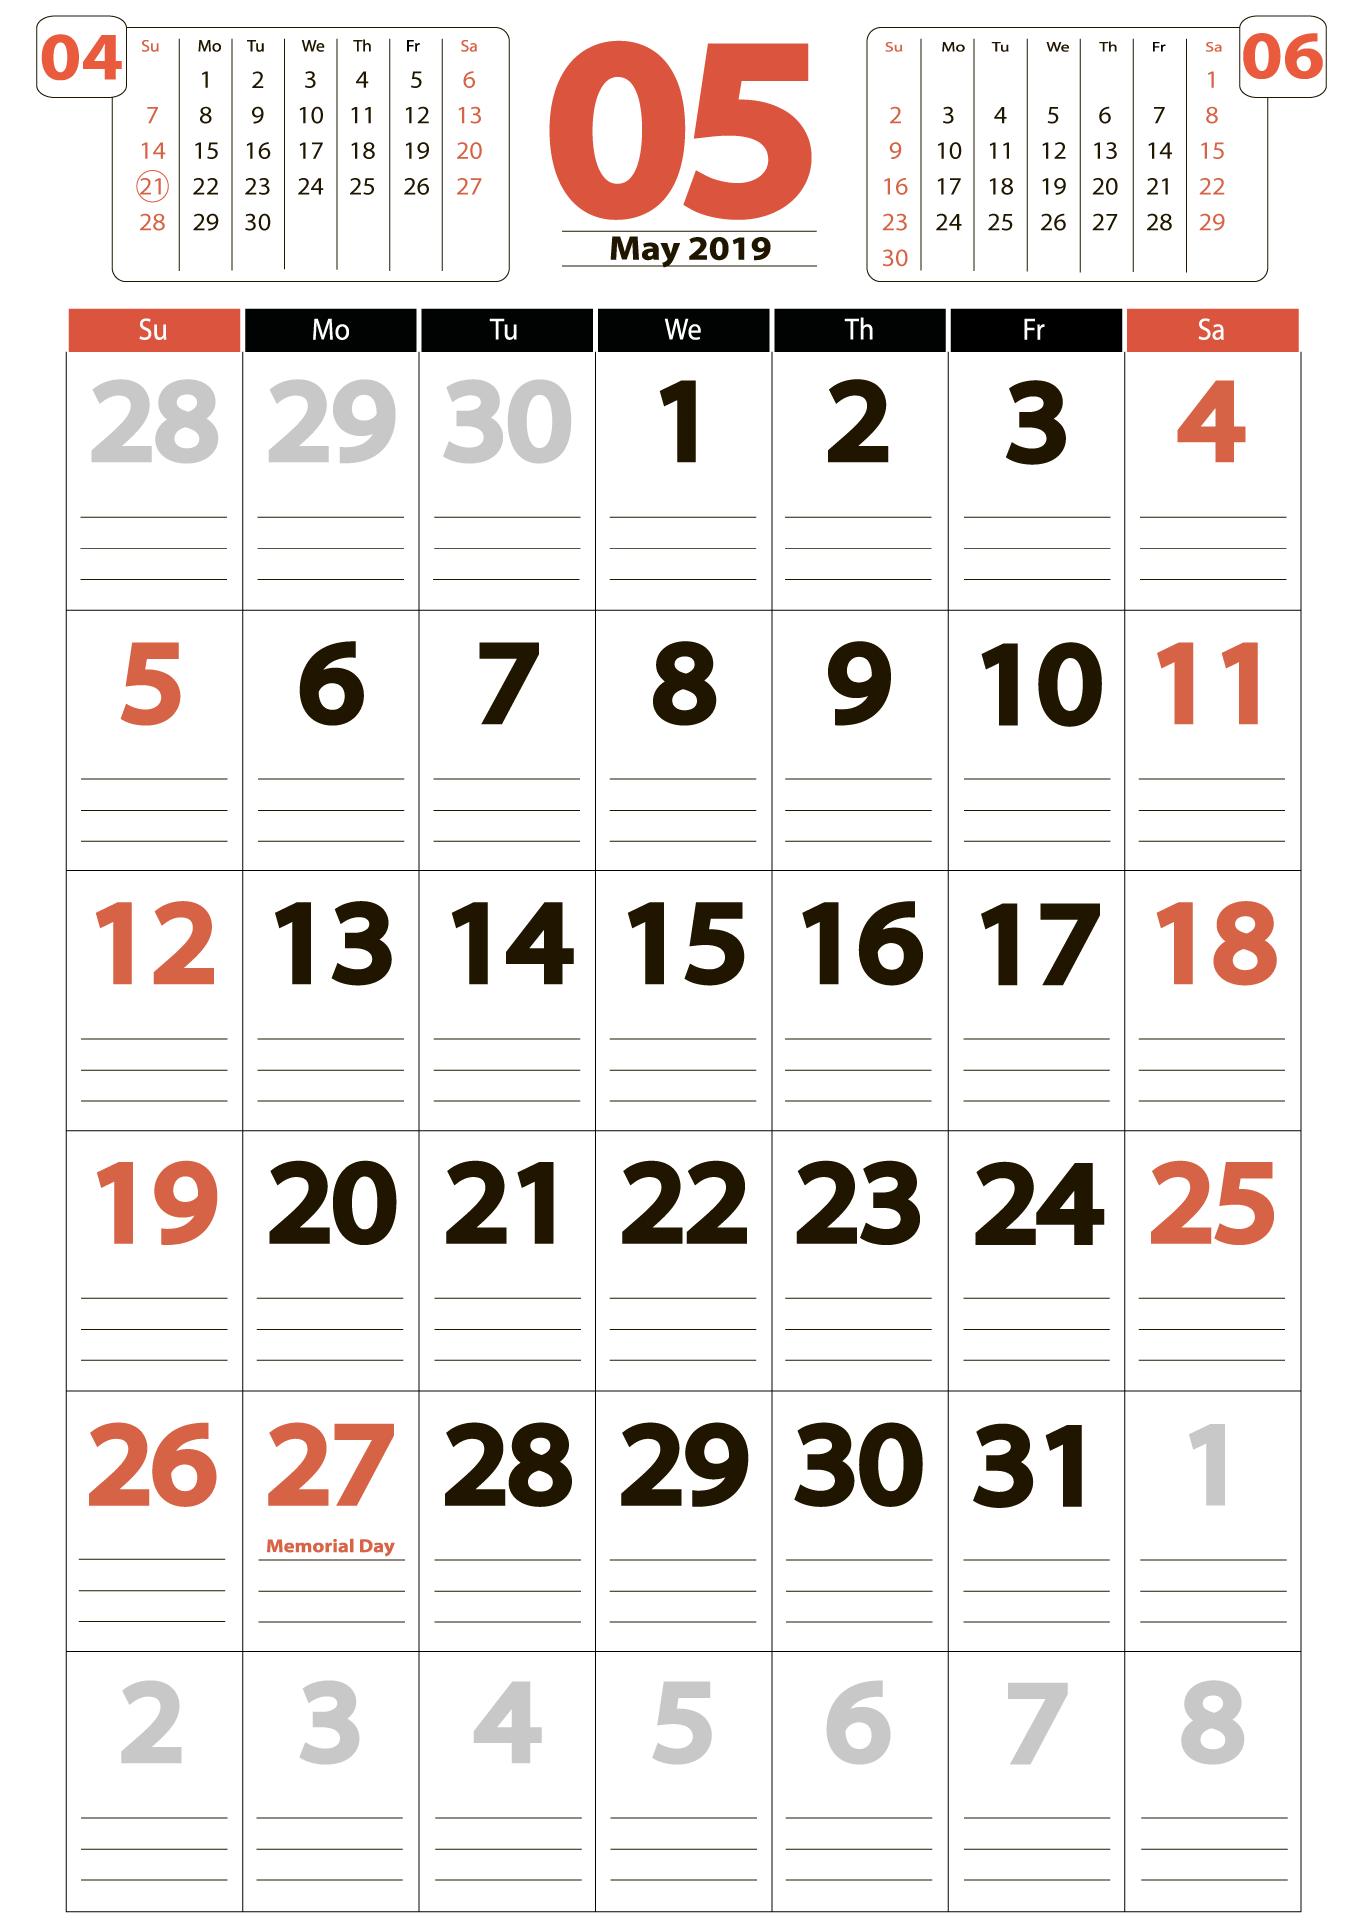 Download calendar 05 2019